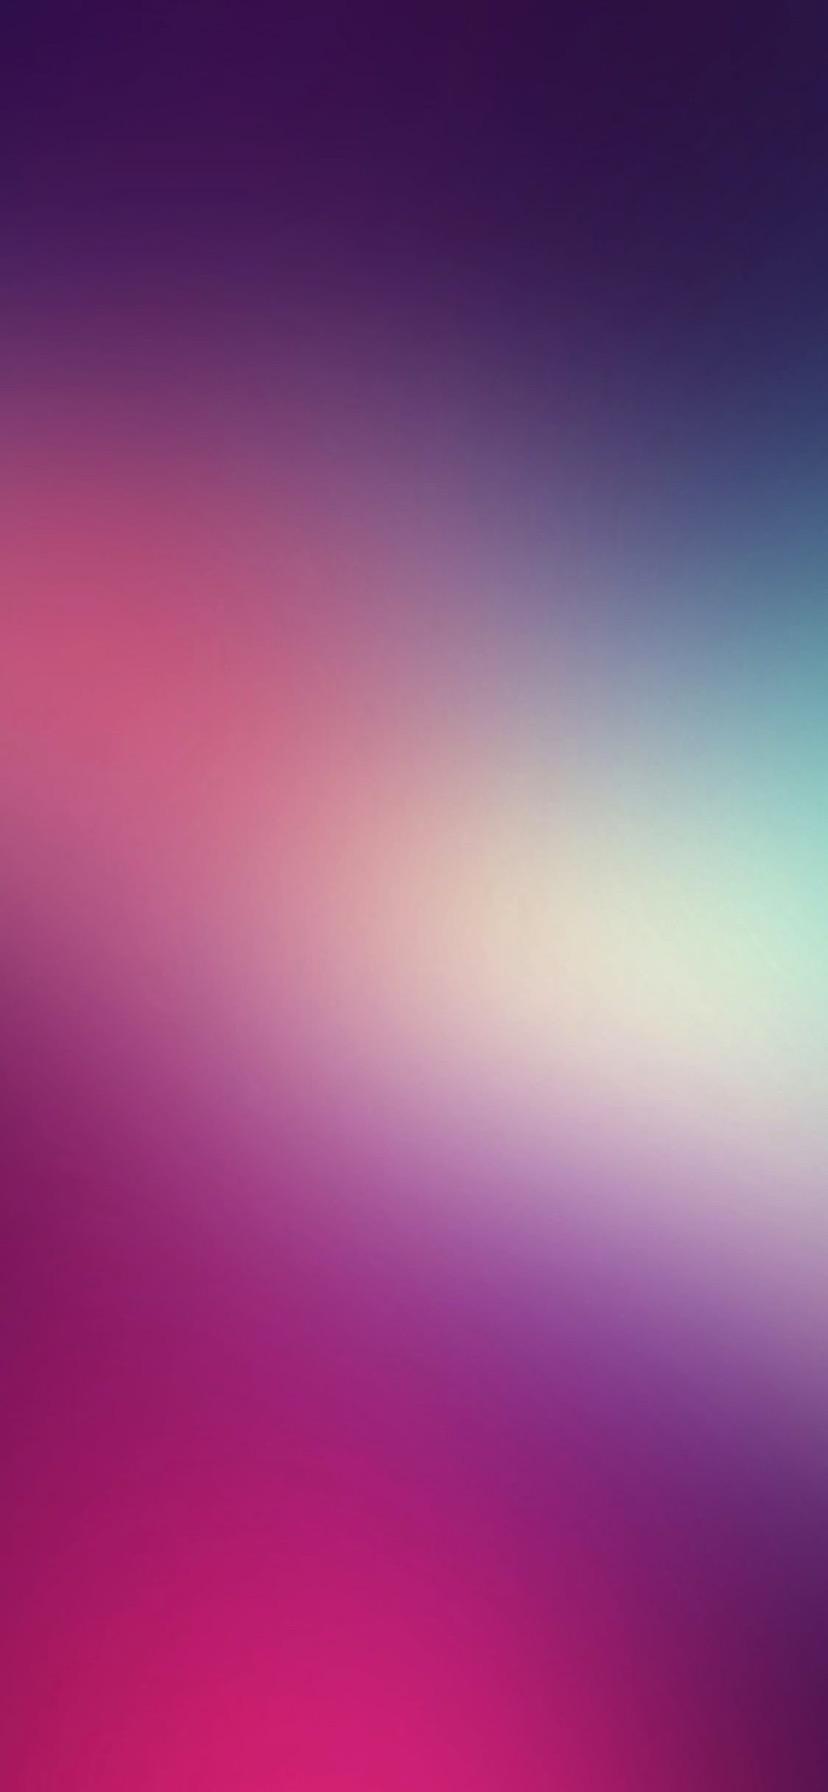 iPhone XR 壁紙 wallpaper 0427